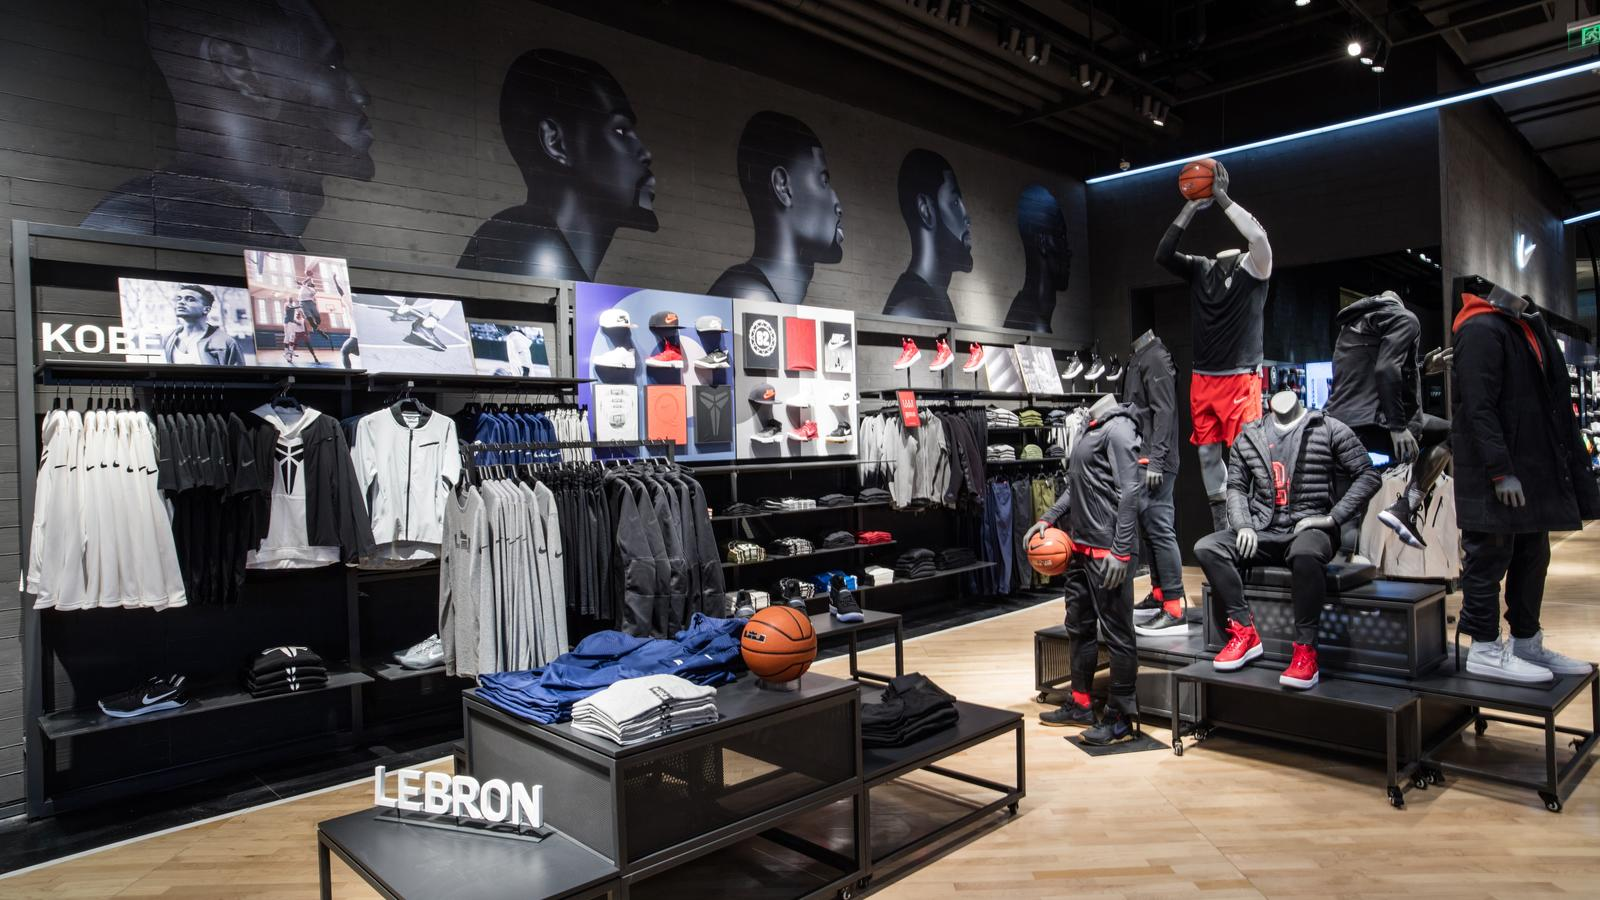 3d Basketball Wallpaper First Look Inside The Nike Amp Jordan Basketball Experience